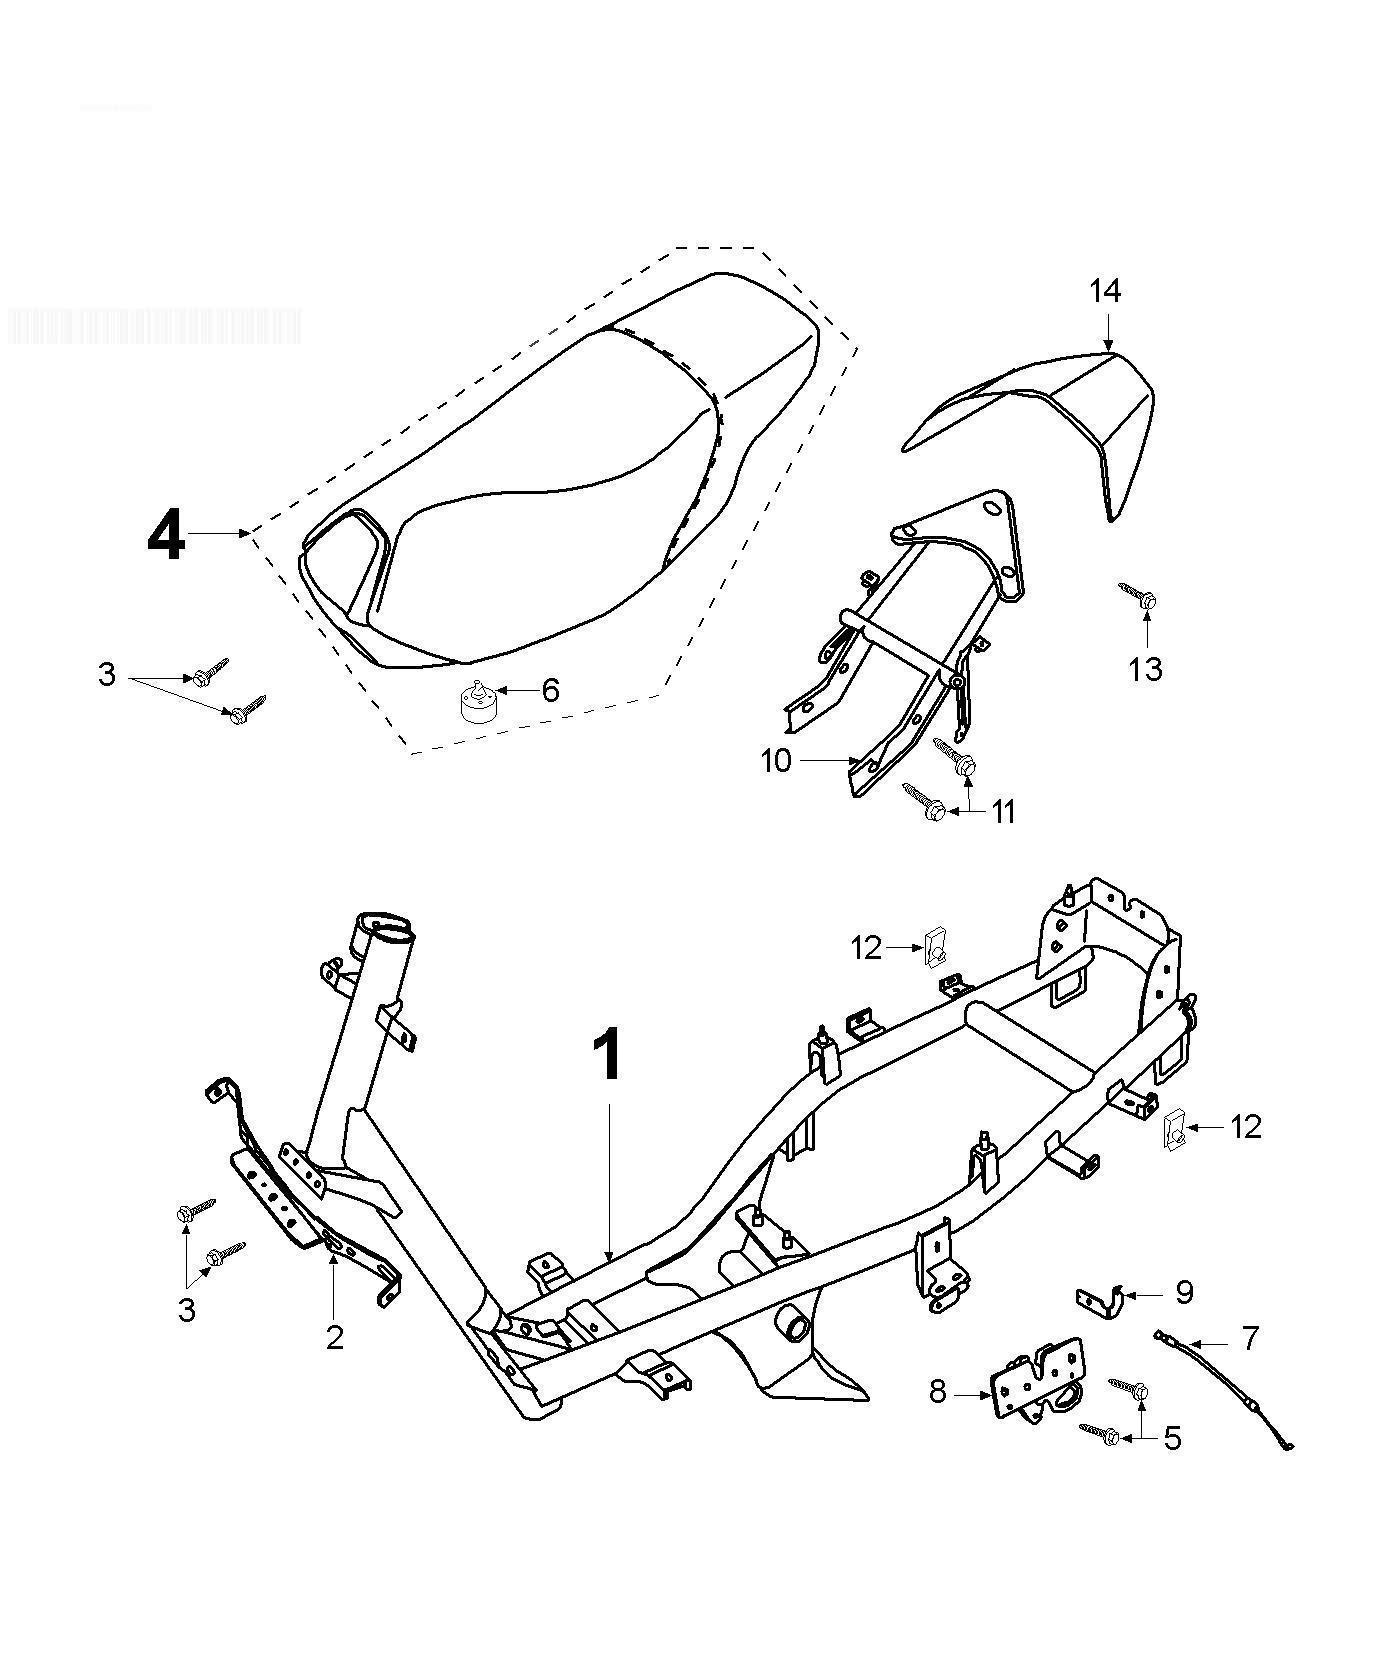 Peugeot speedfight 2 100 n gp frame saddle carrier